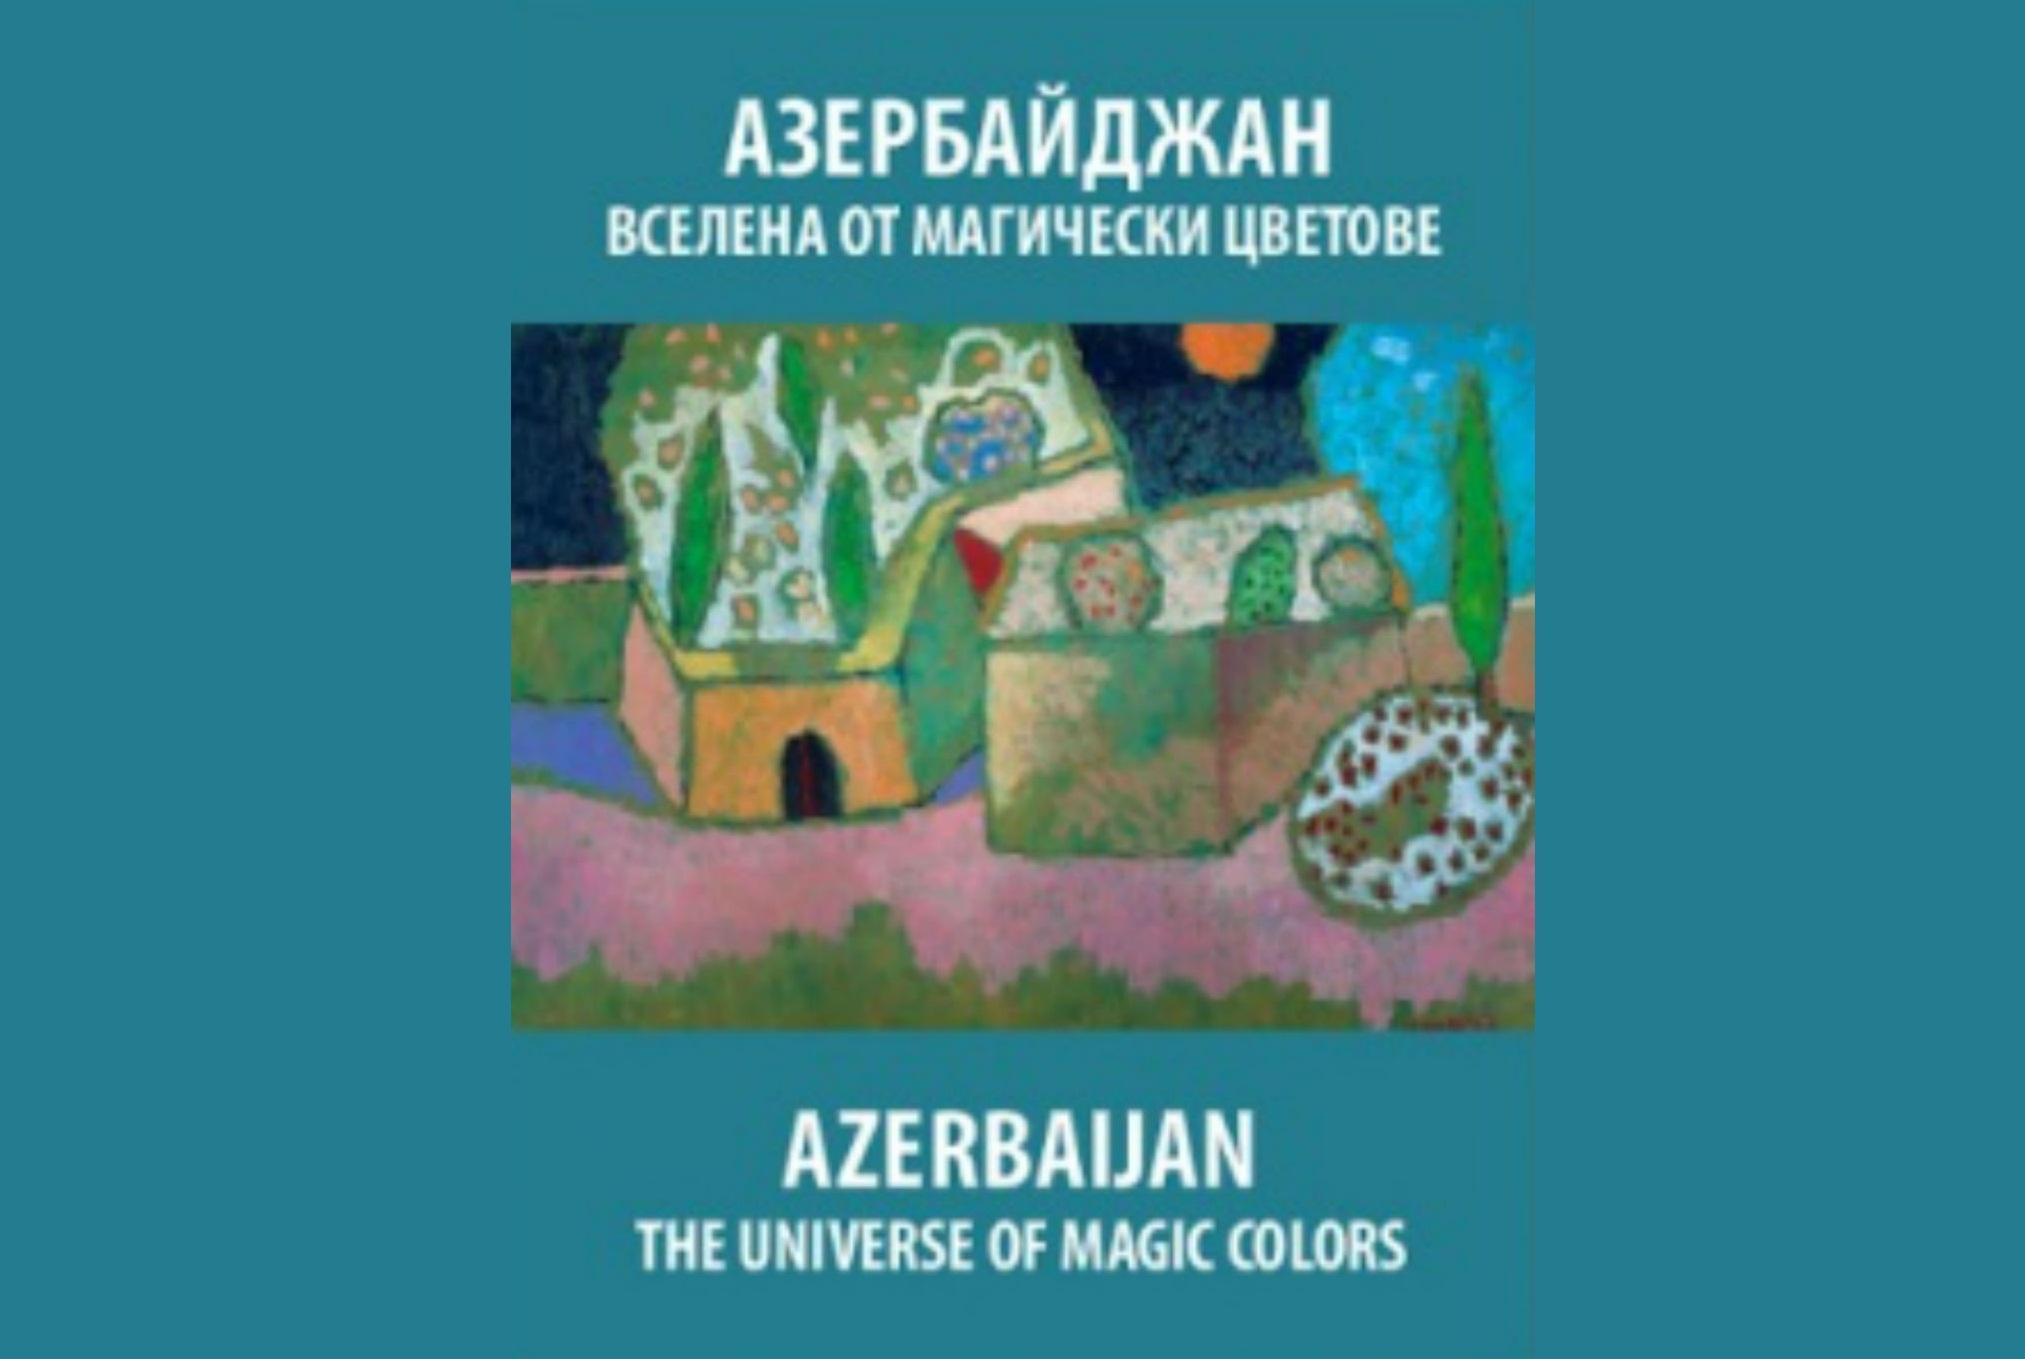 Sofia to host exhibition of paintings dedicated to Azerbaijan